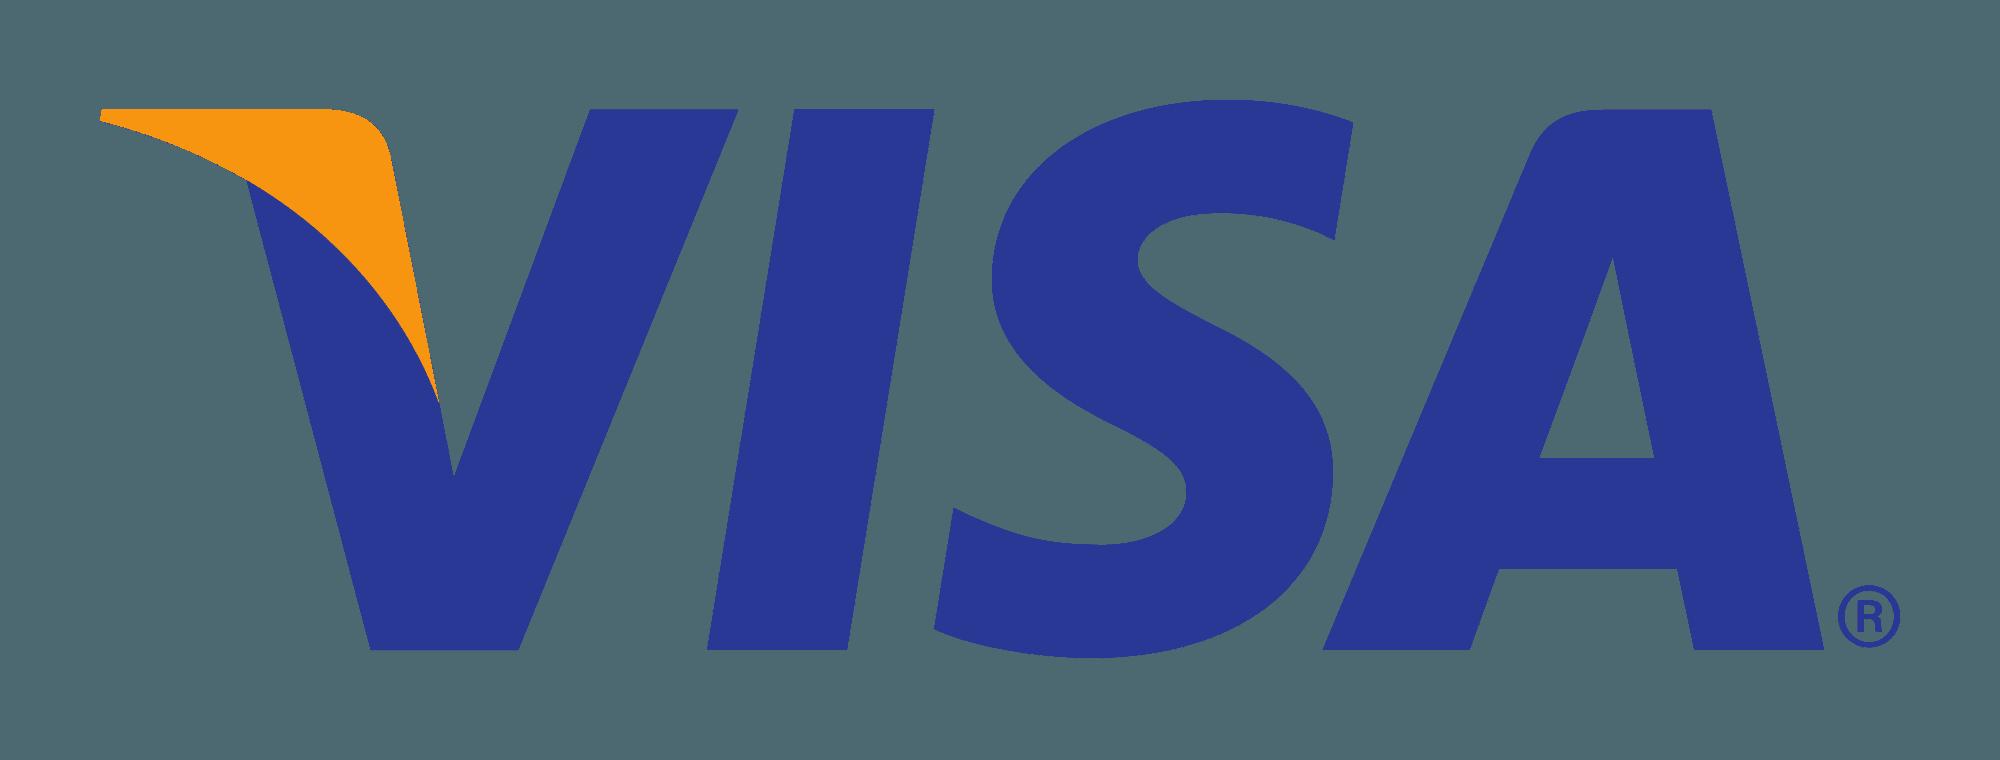 visa-2000px